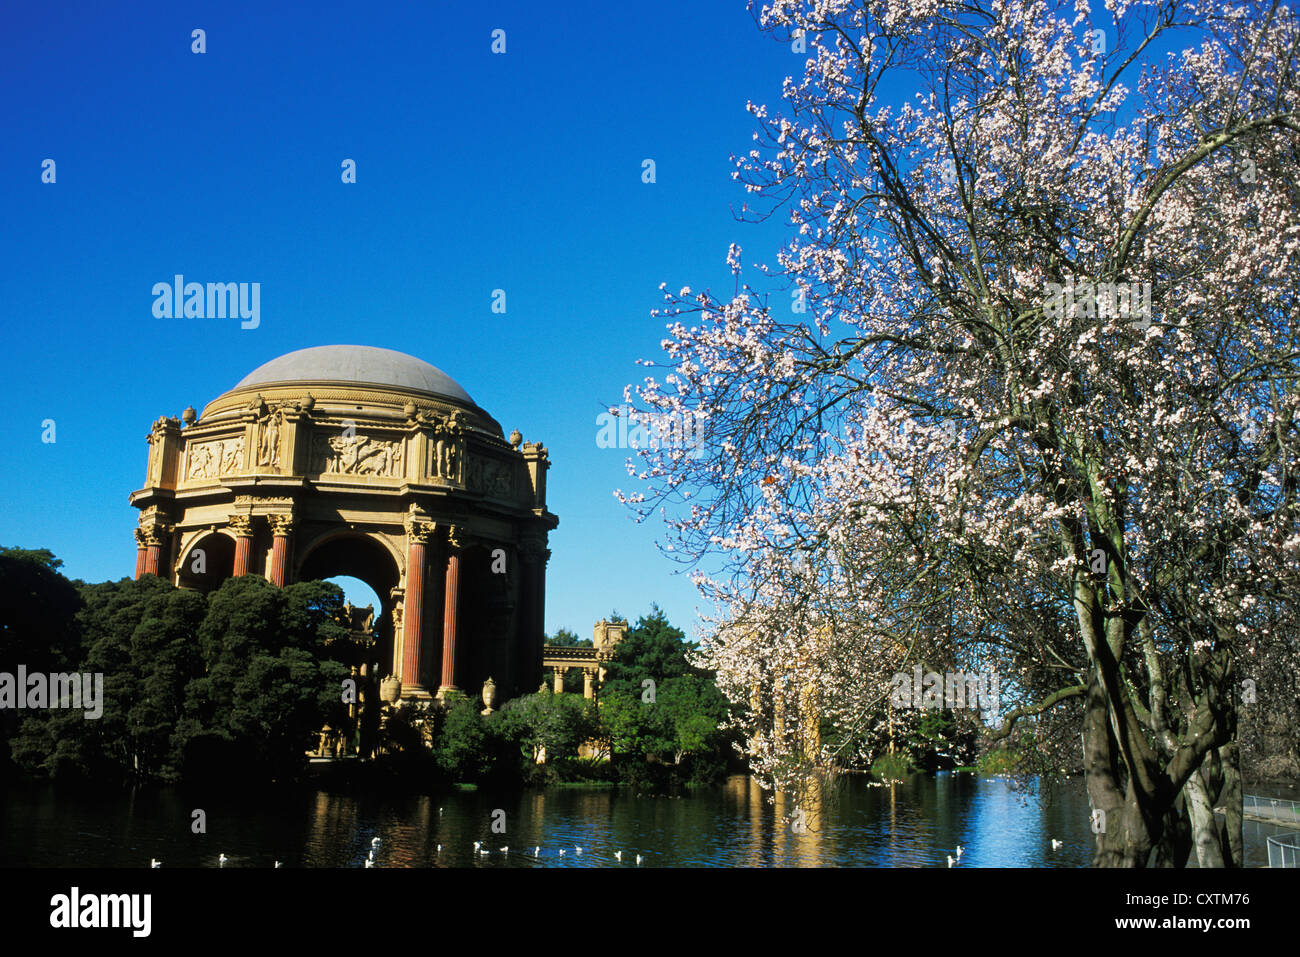 Palace of Fine Arts in San Francisco, Kalifornien. Stockbild